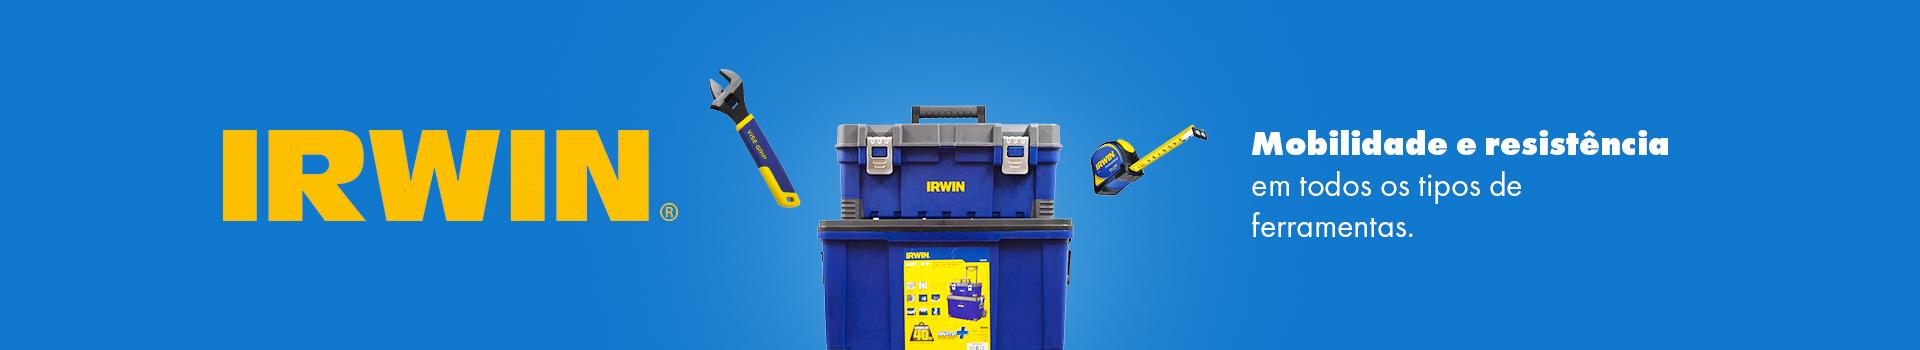 Banner marca irwin